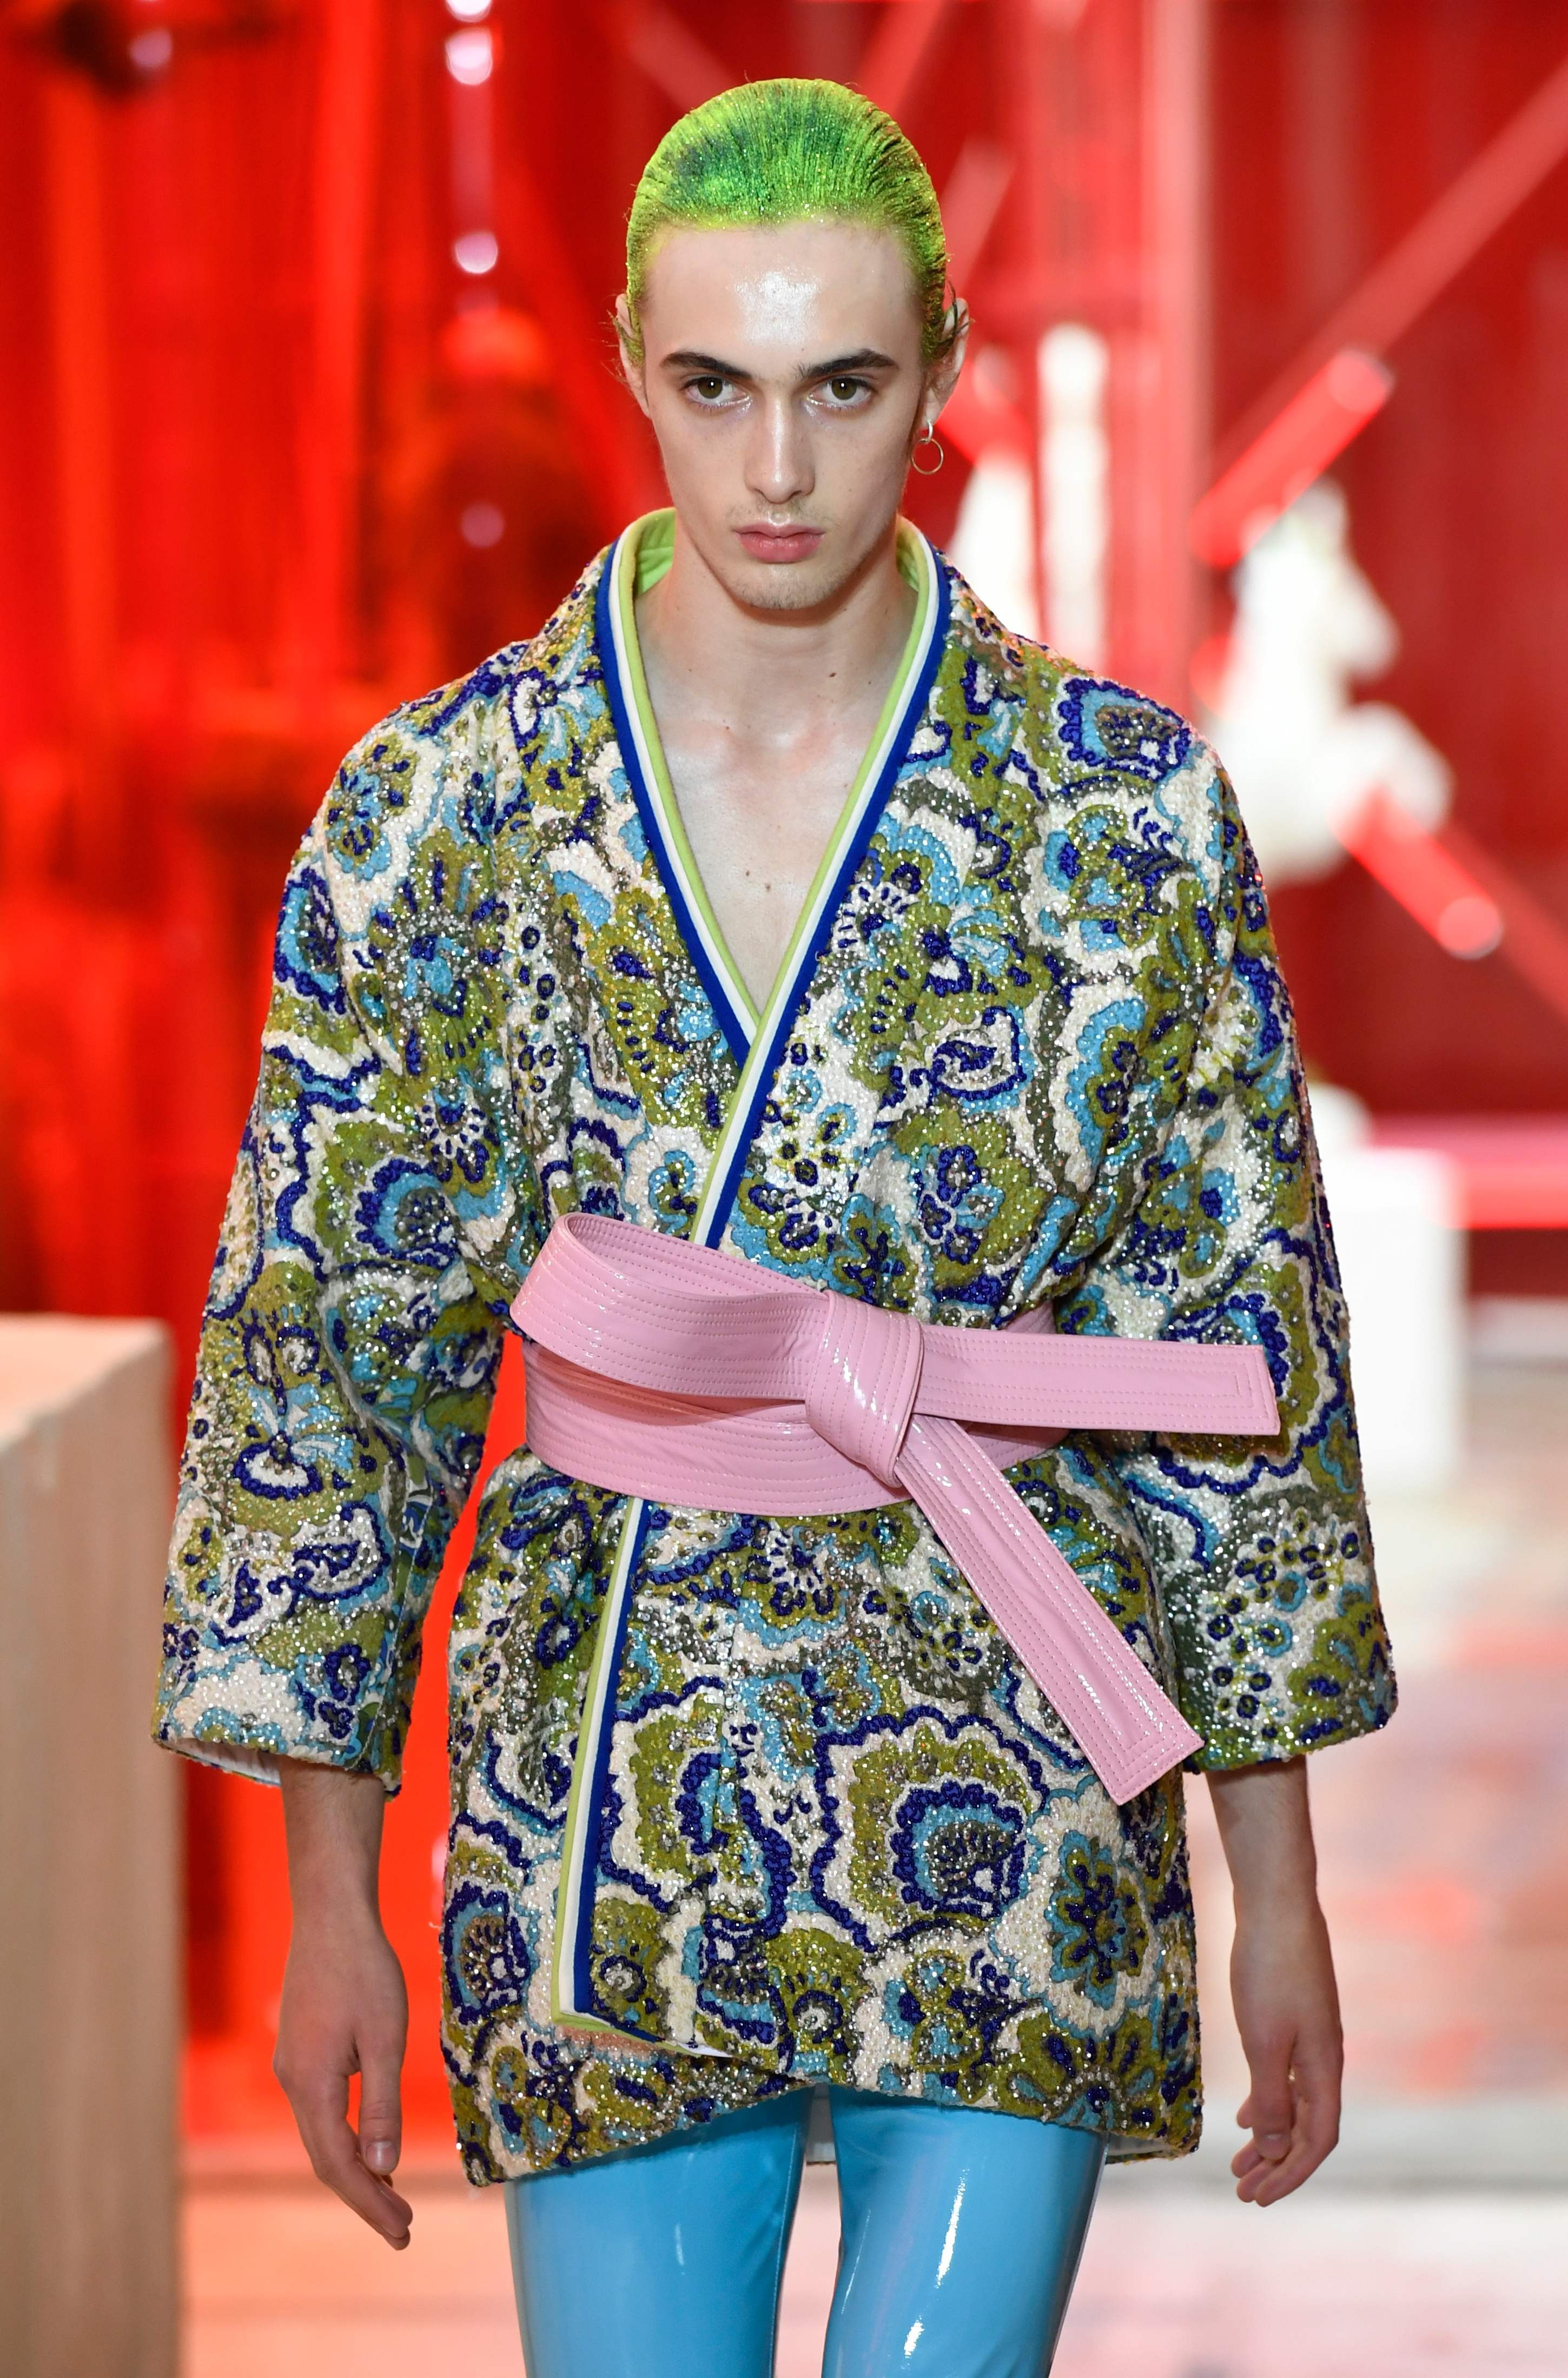 Watch Paris Fashion Week Day 3: Givenchy, Maison Margiela Berluti video